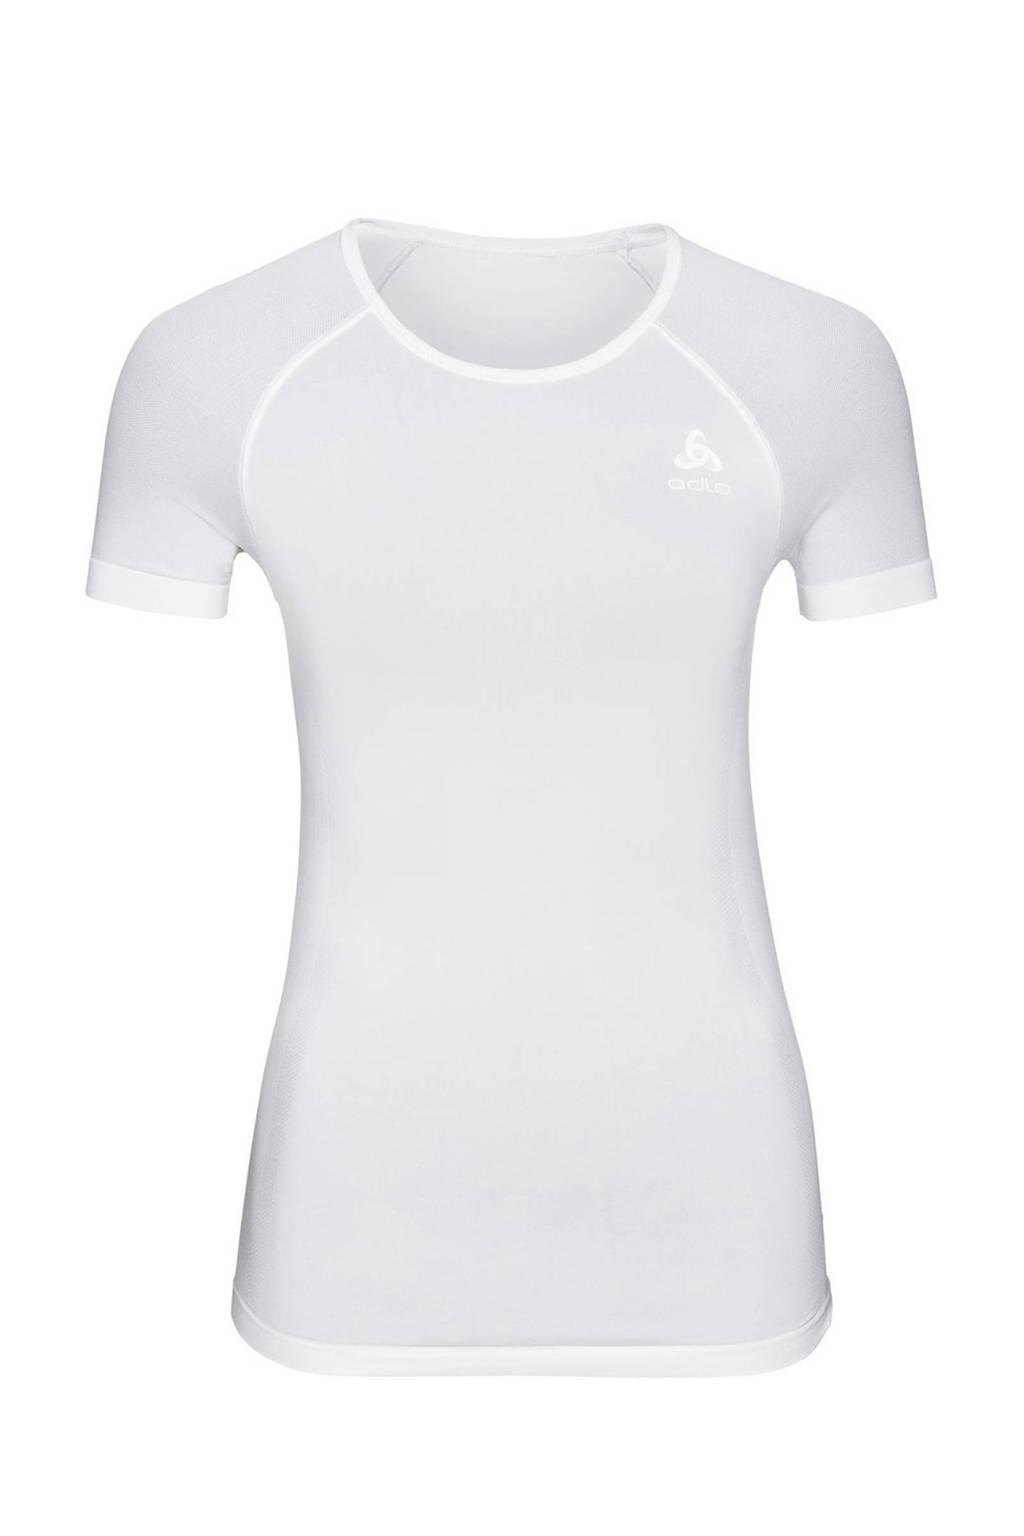 Odlo sport ondershirt wit, Wit